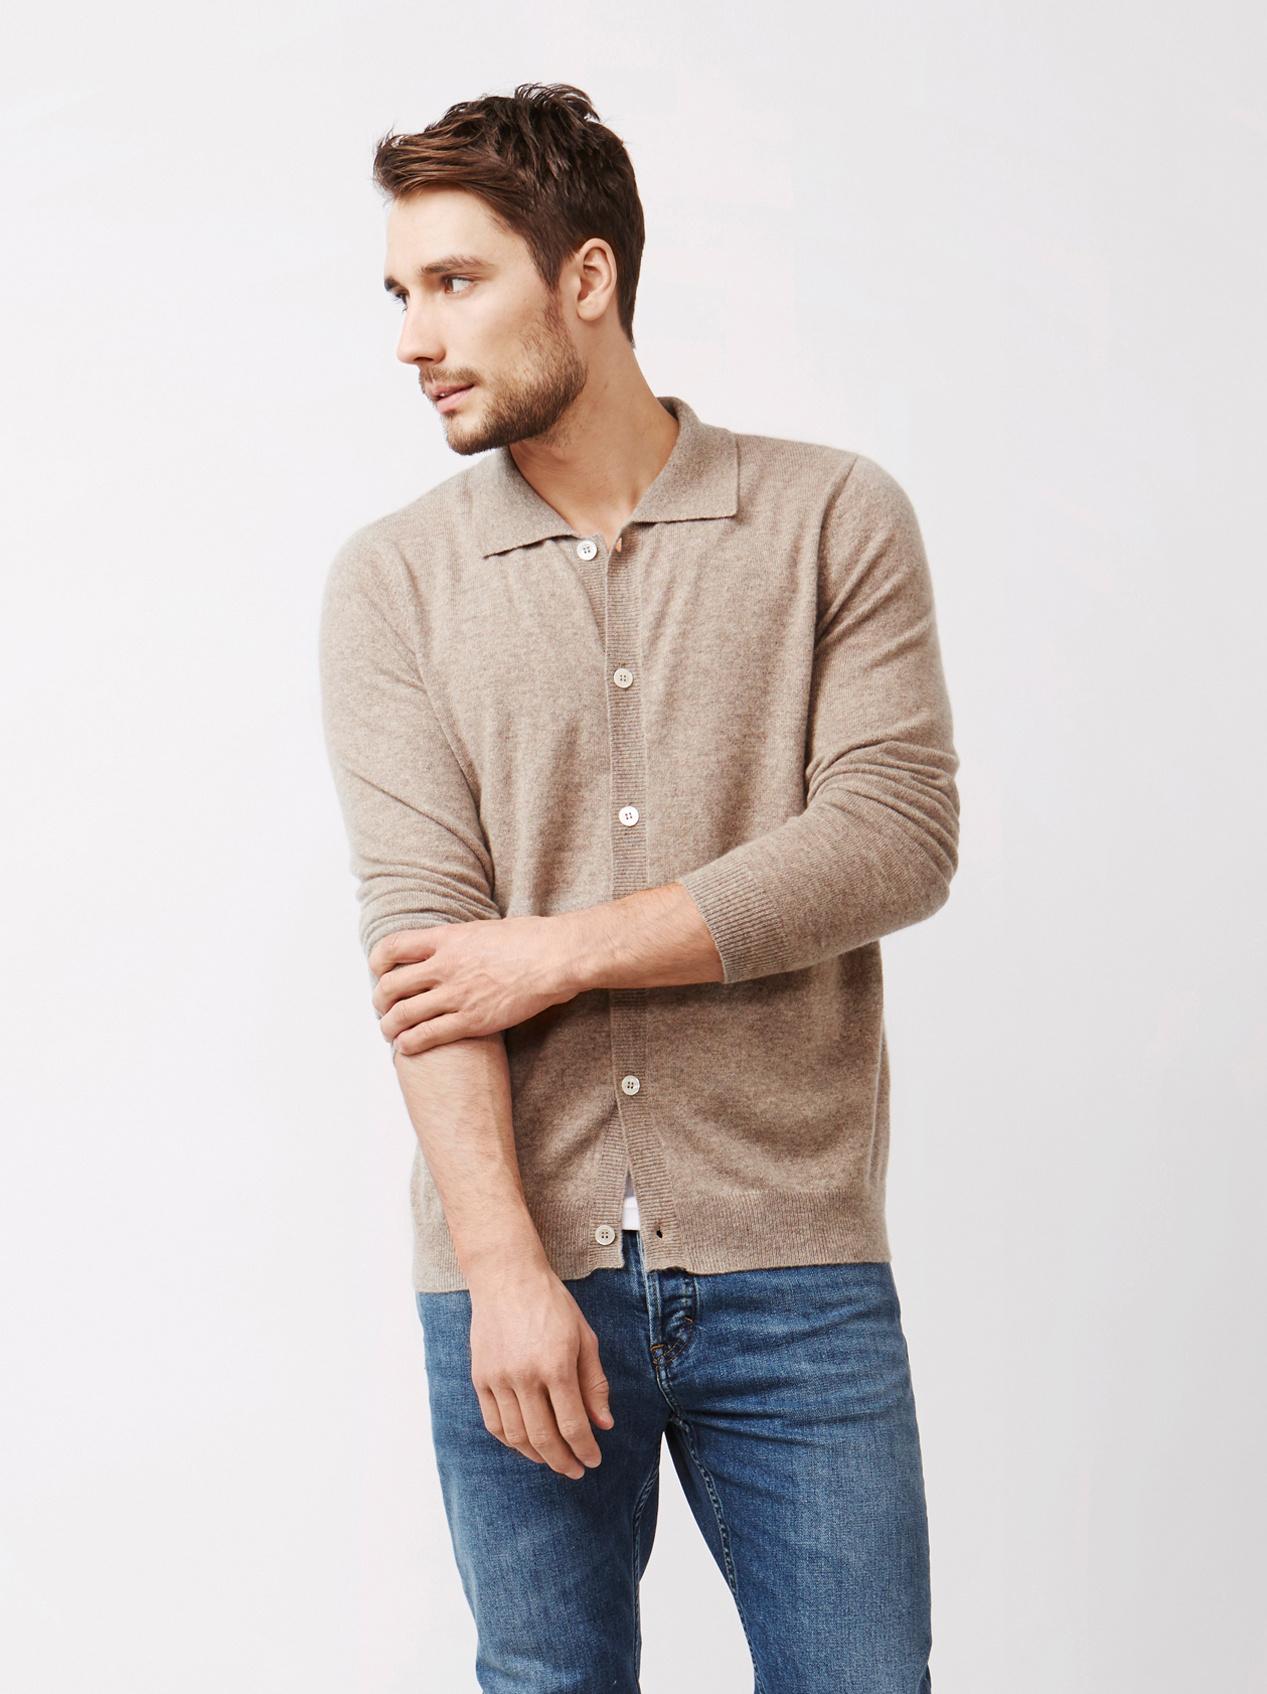 Soft Goat Men's Collar Cardigan Taupe